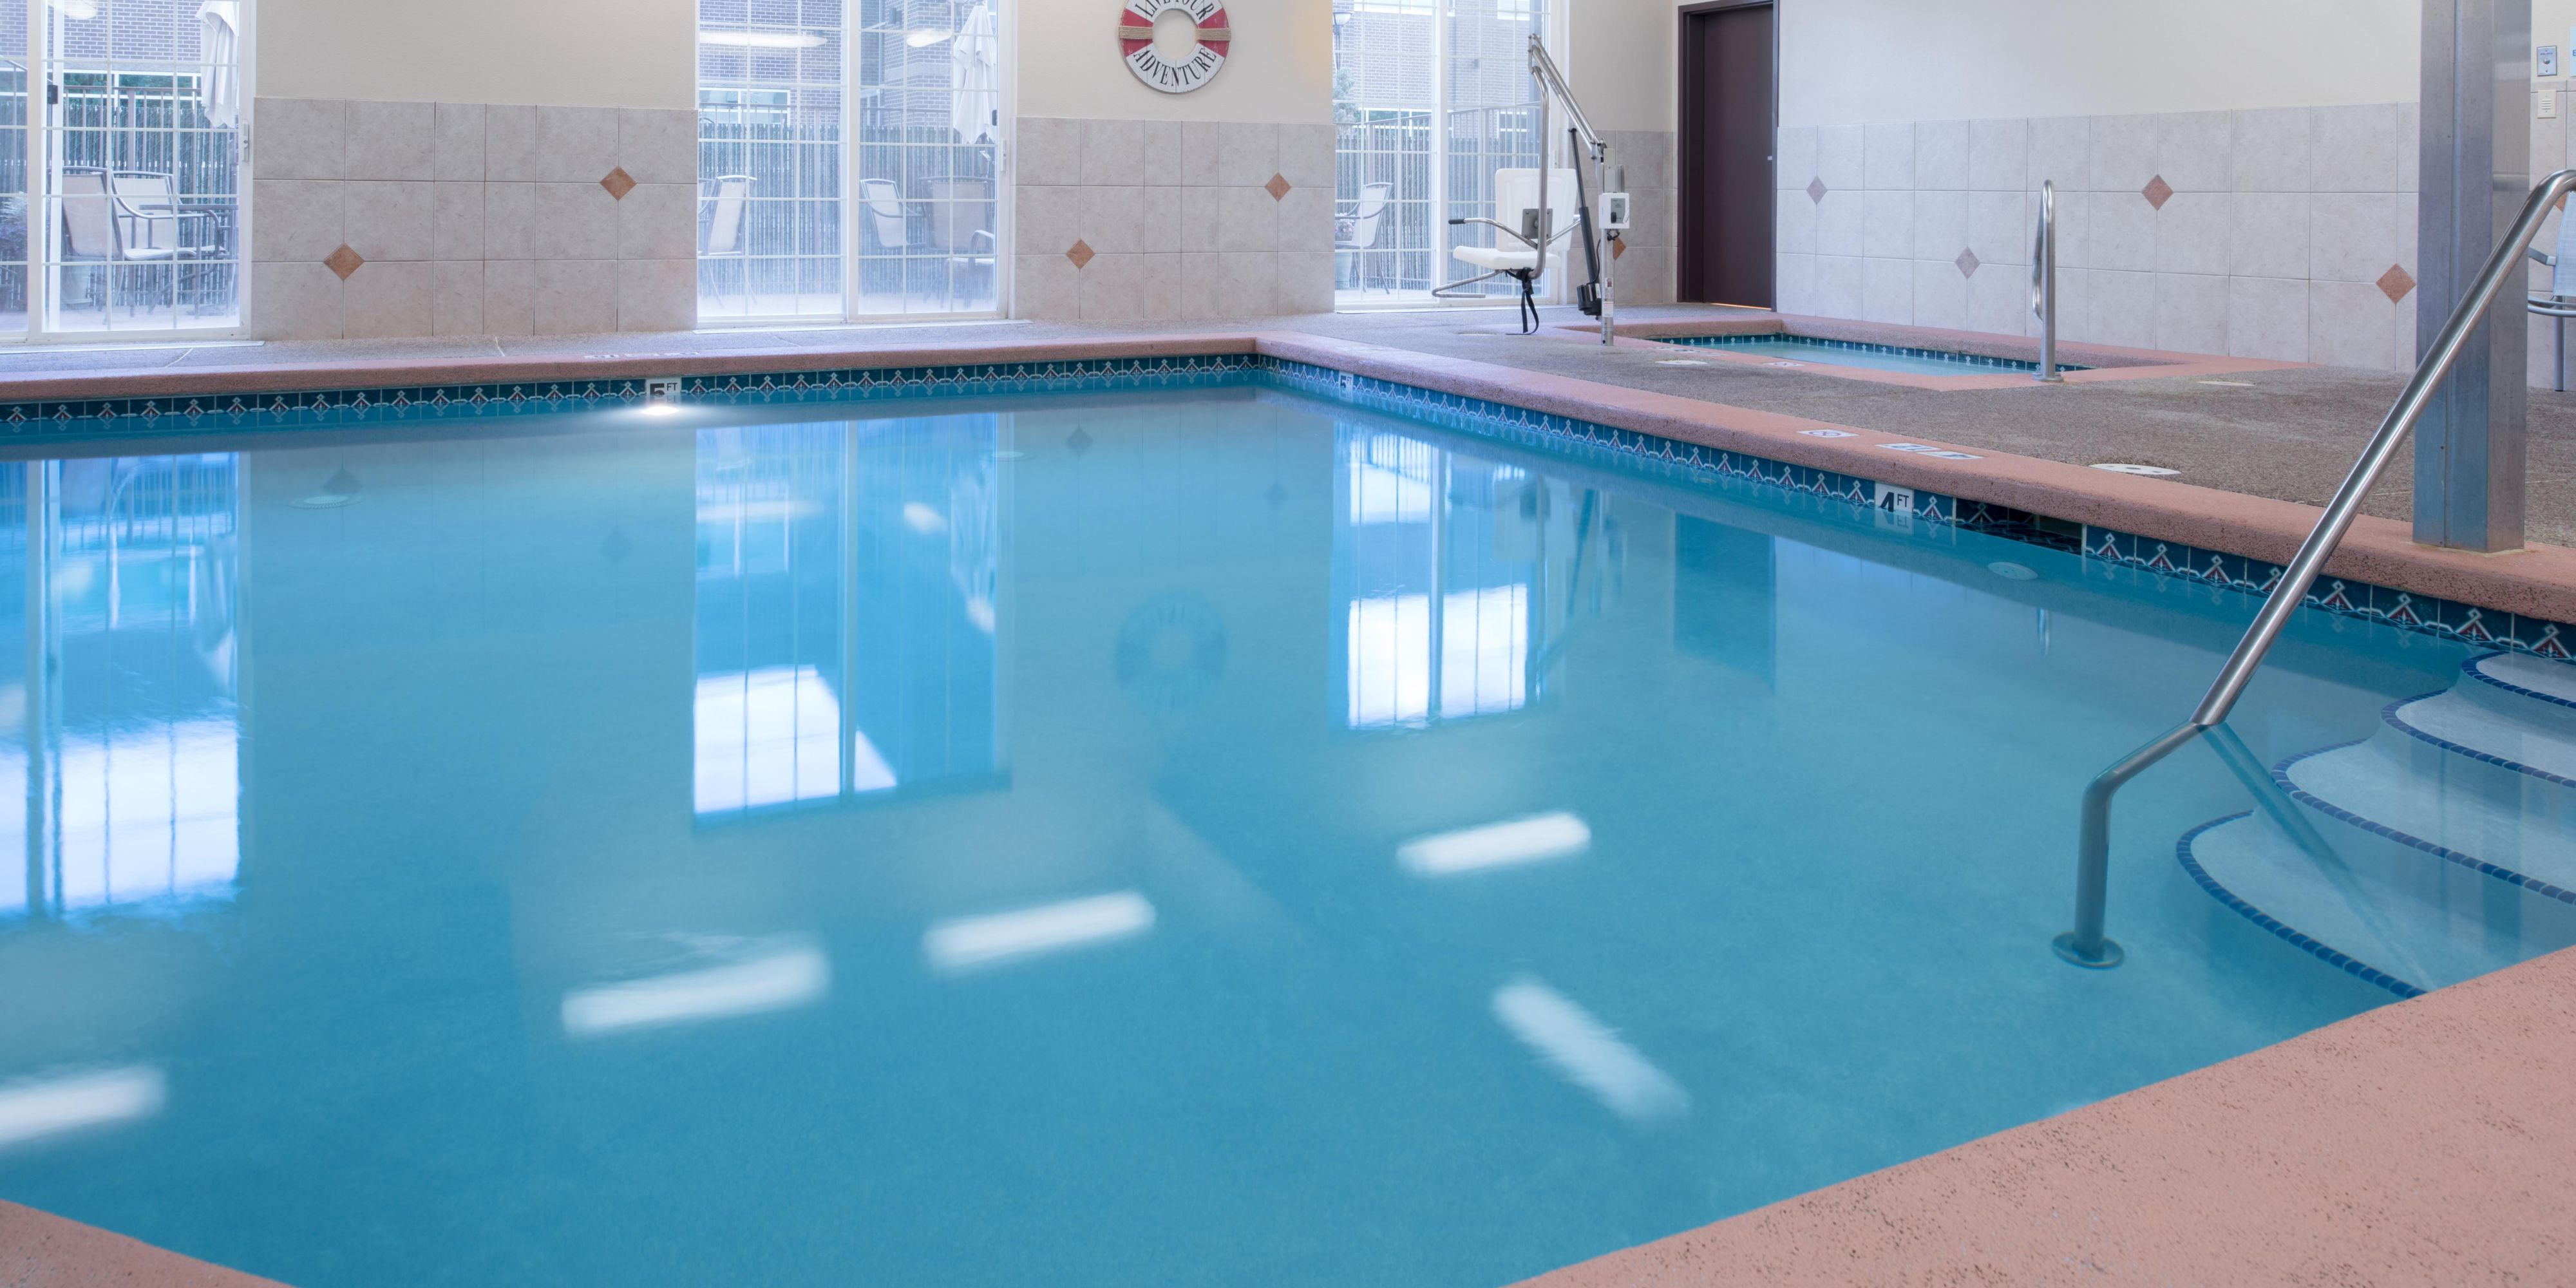 Holiday Inn Express Spokane 4220172404 2x1